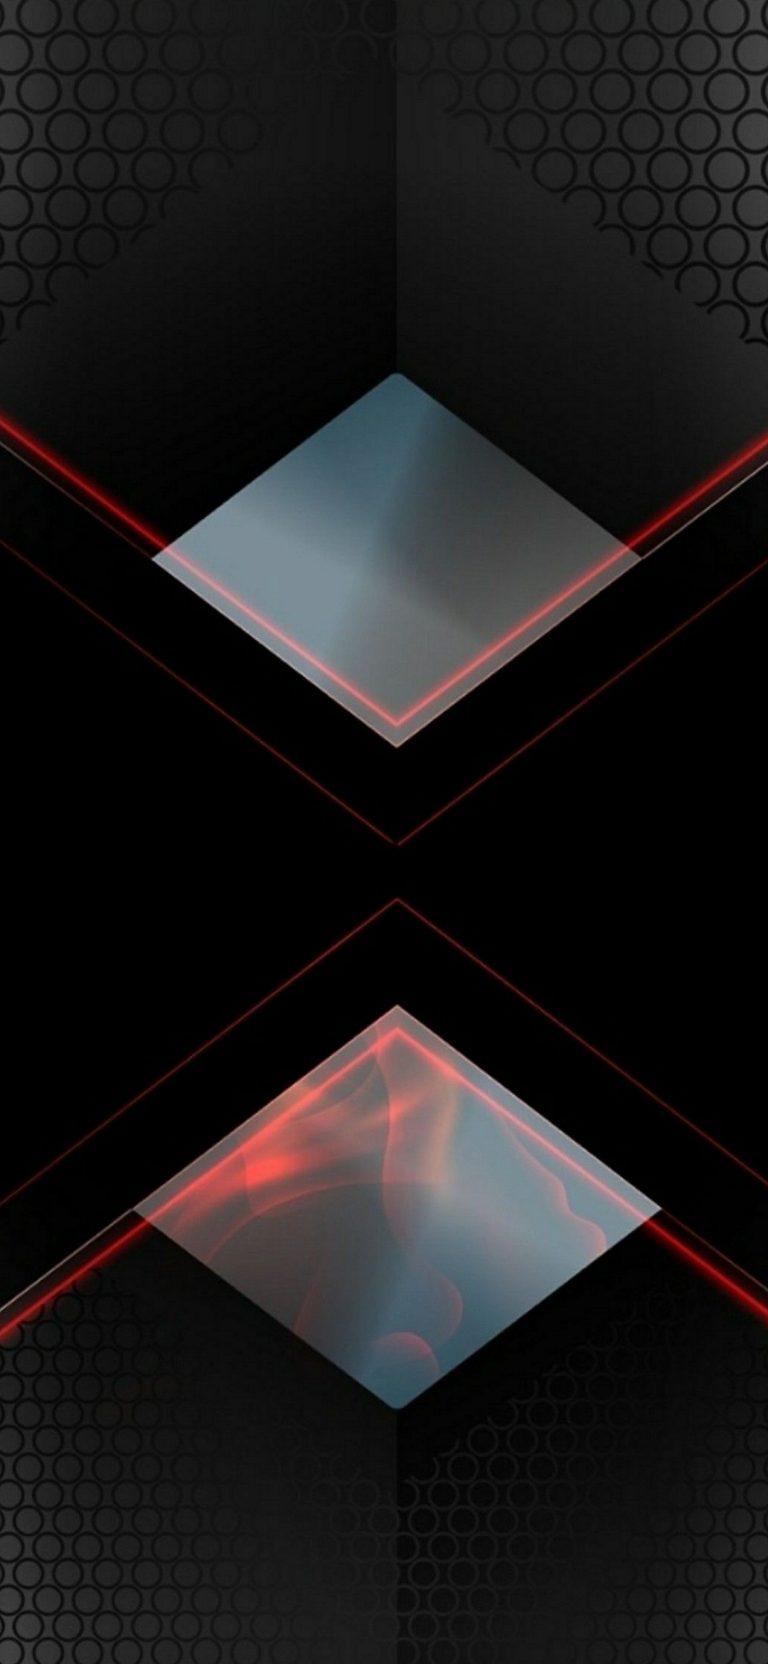 Amoled Phone Wallpaper 040 1080x2340 768x1664